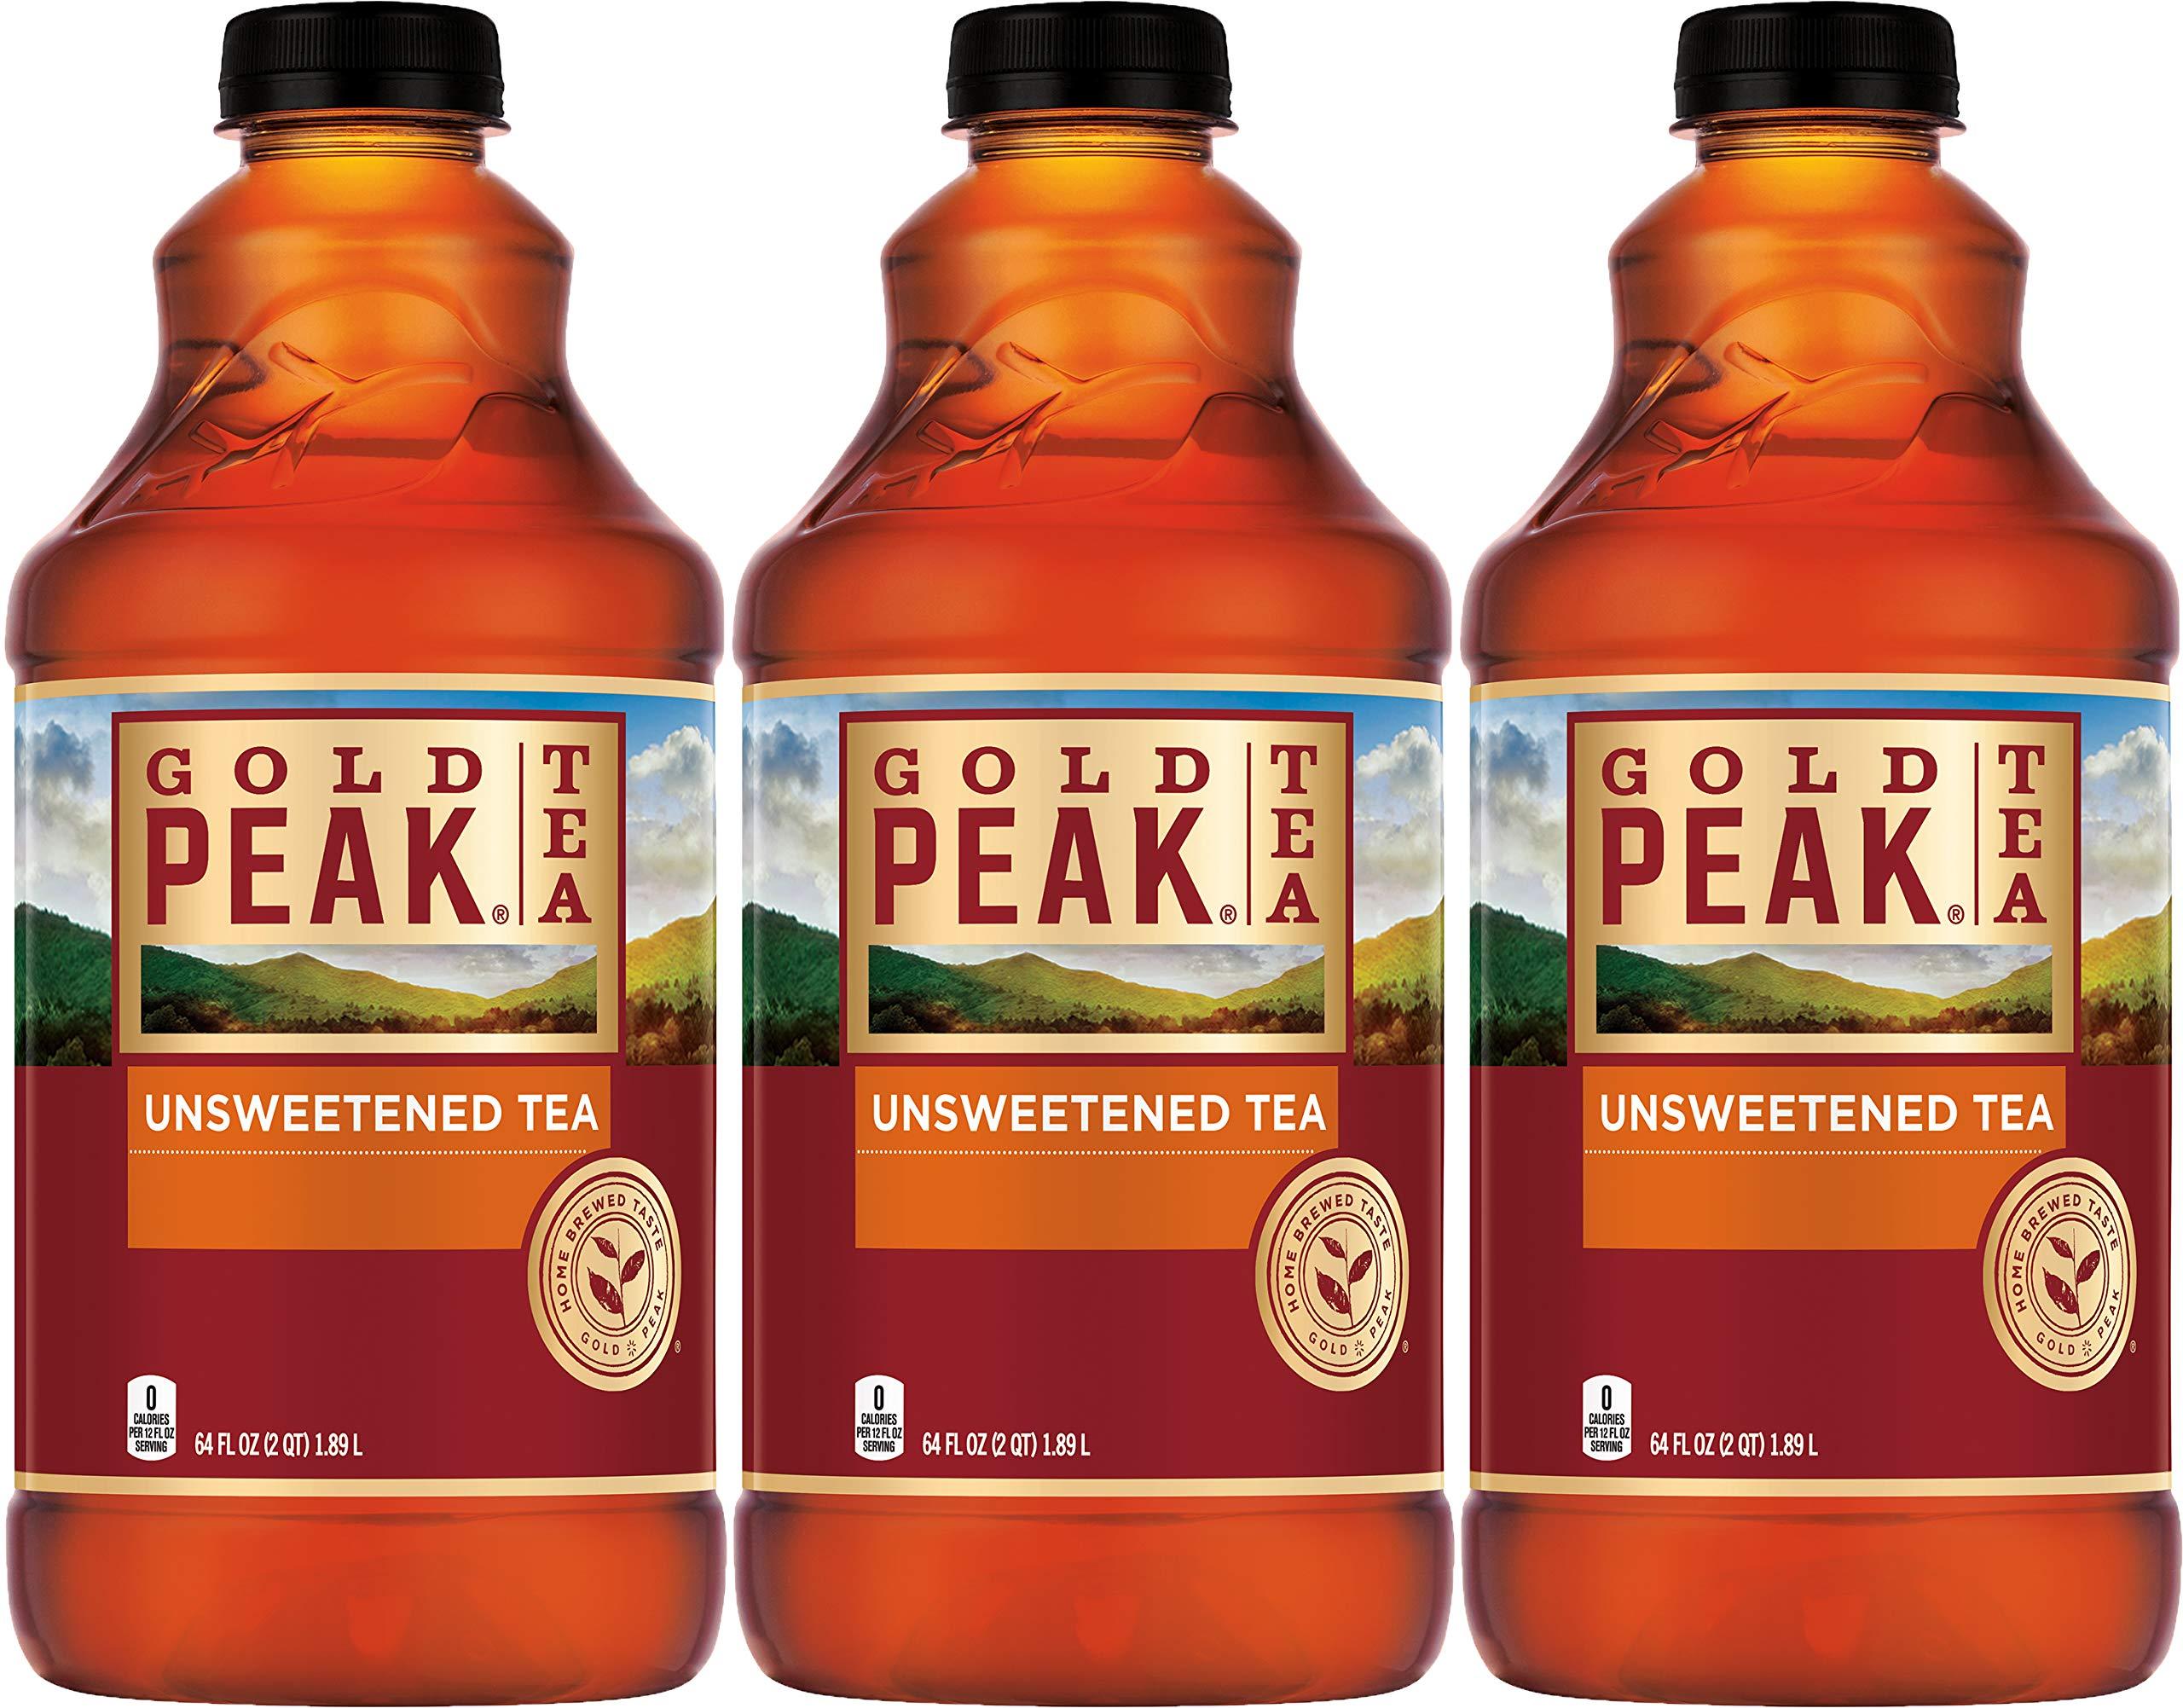 Gold Peak Unsweetened Iced Tea, 64 Fl Oz (Pack of 3, Total of 192 Fl Oz)